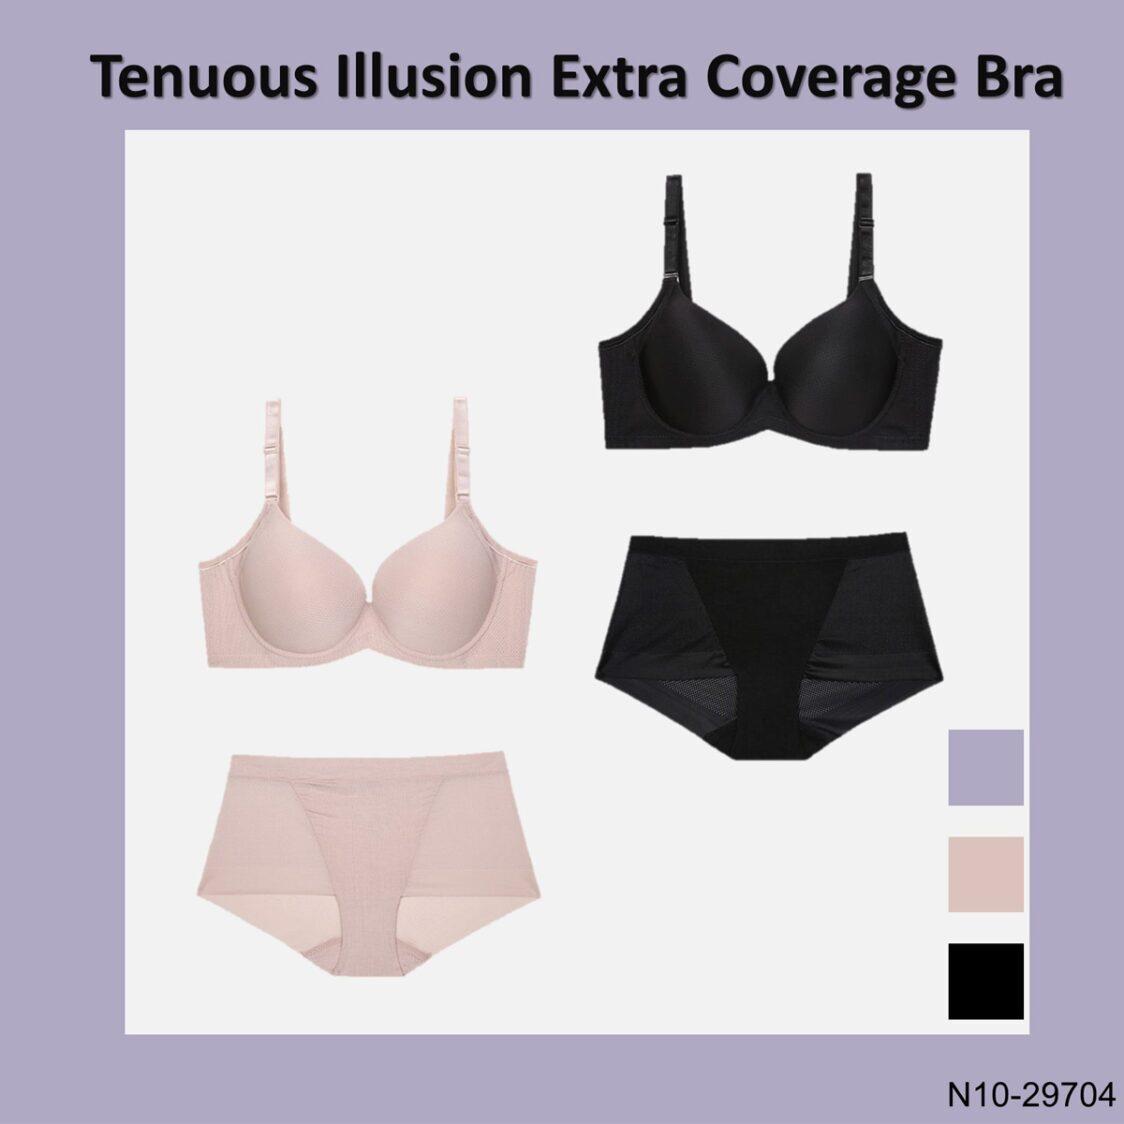 Tenuous Illusion Extra Coverage Bra N10-29704BRN Brown